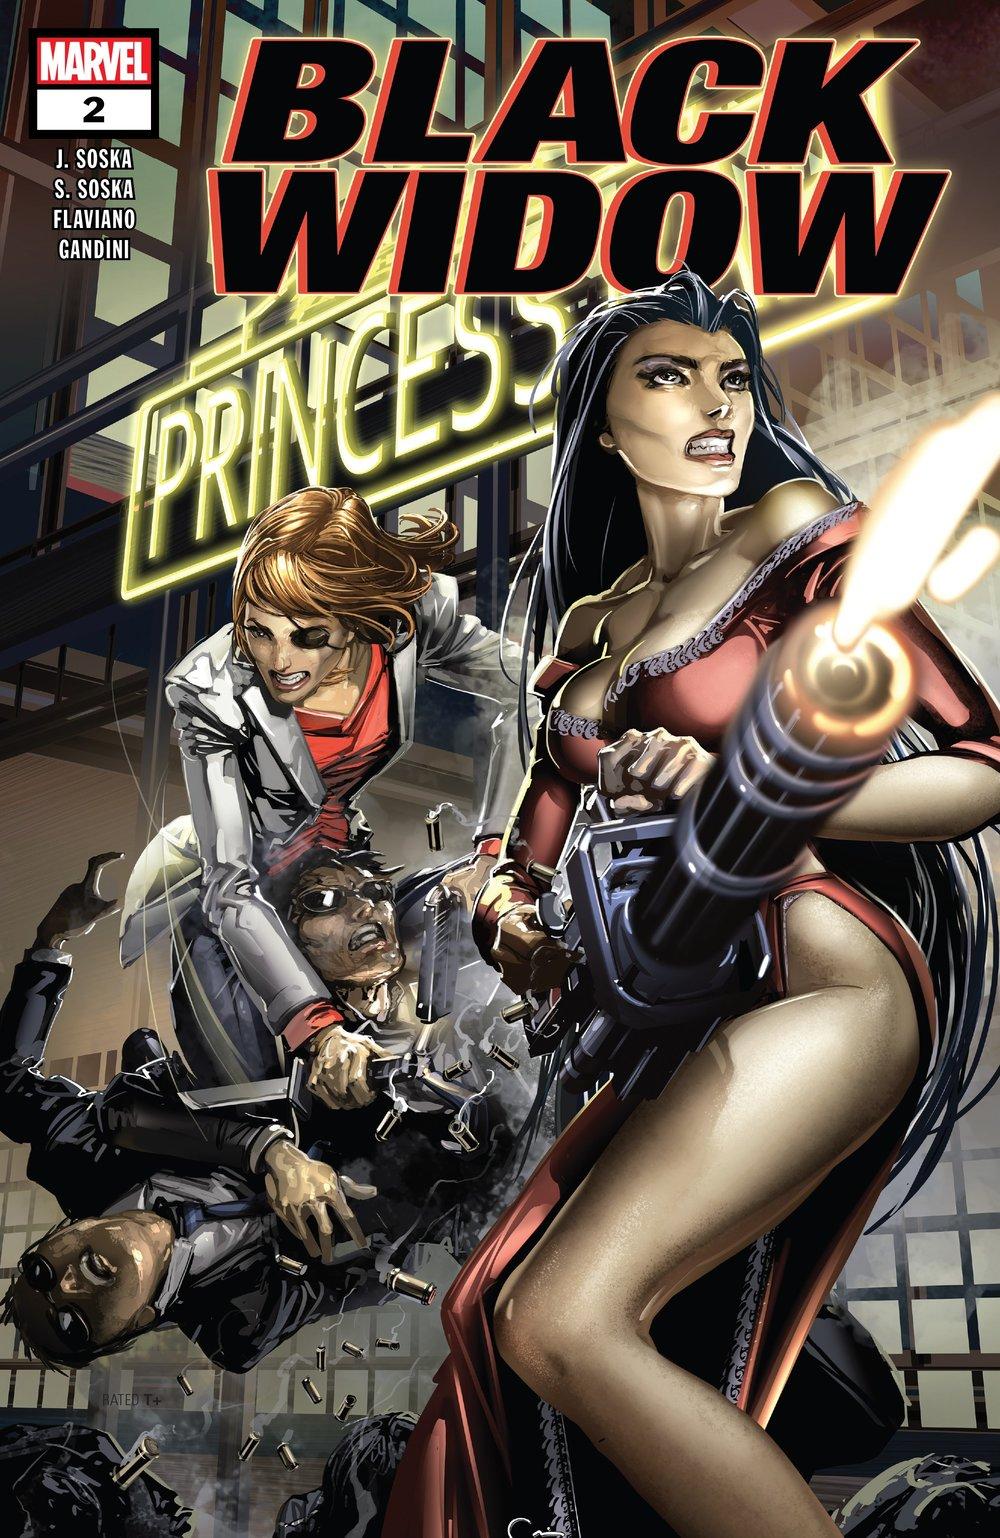 Black Widow Porn Video black widow #2 // review — you don't read comics